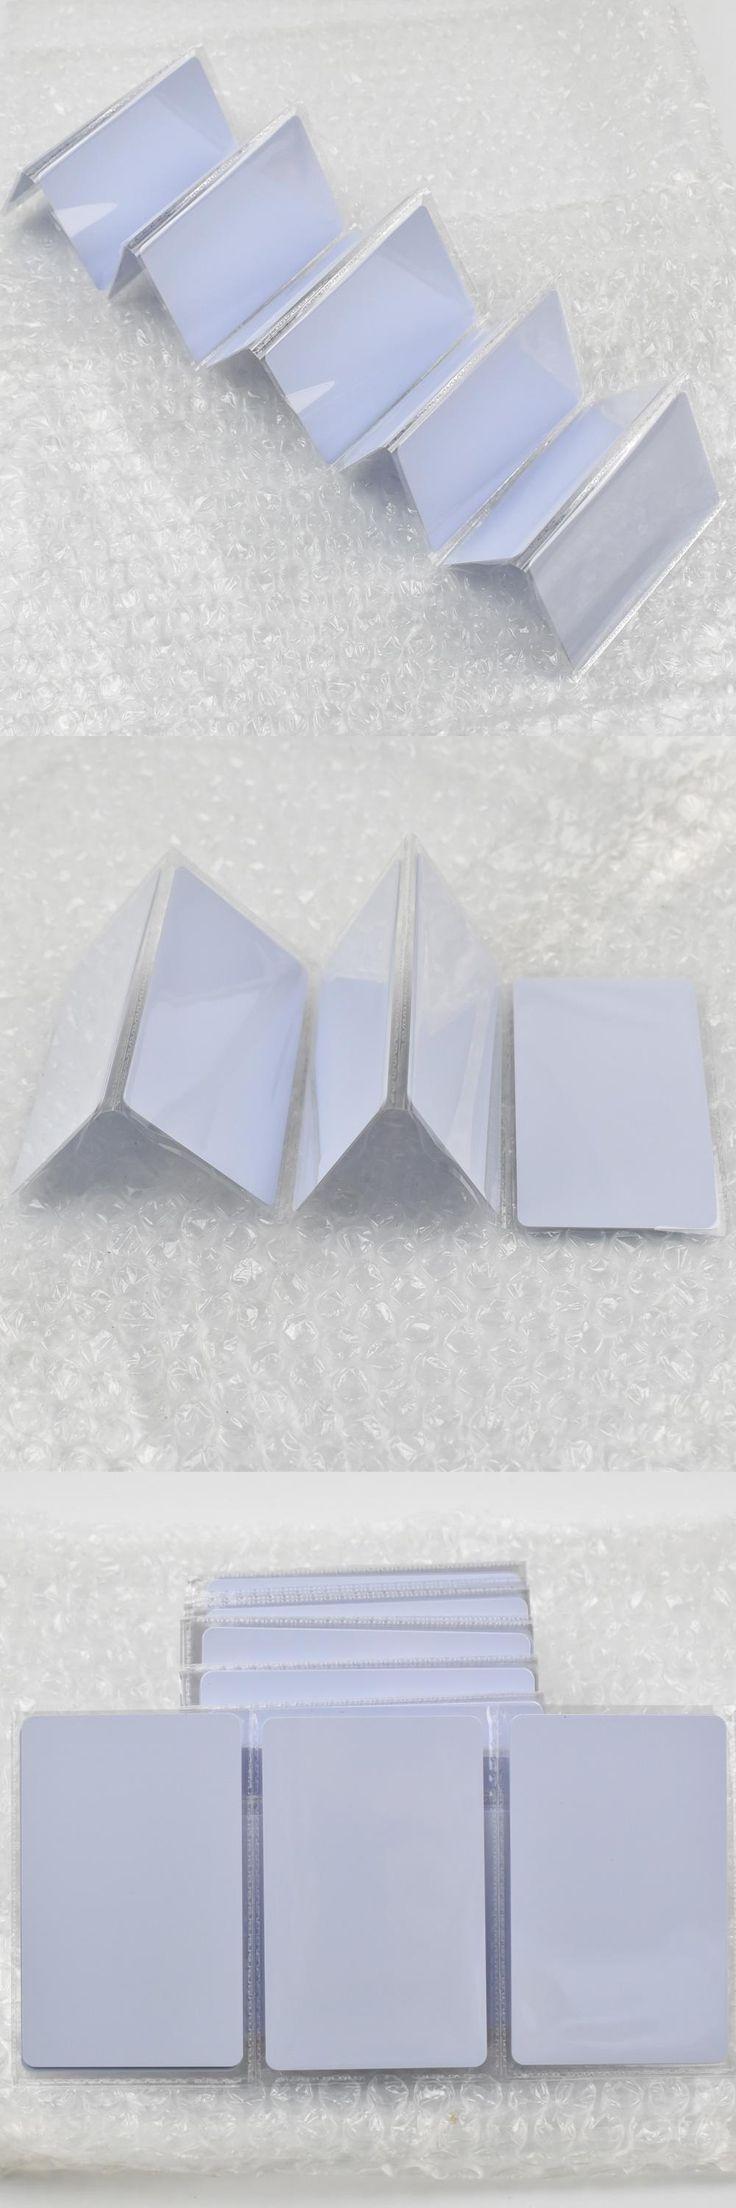 [Visit to Buy]  125khz writable rewrite blank white t5577 rfid card,rfid key card,hotel key card  1pcs/lot #Advertisement